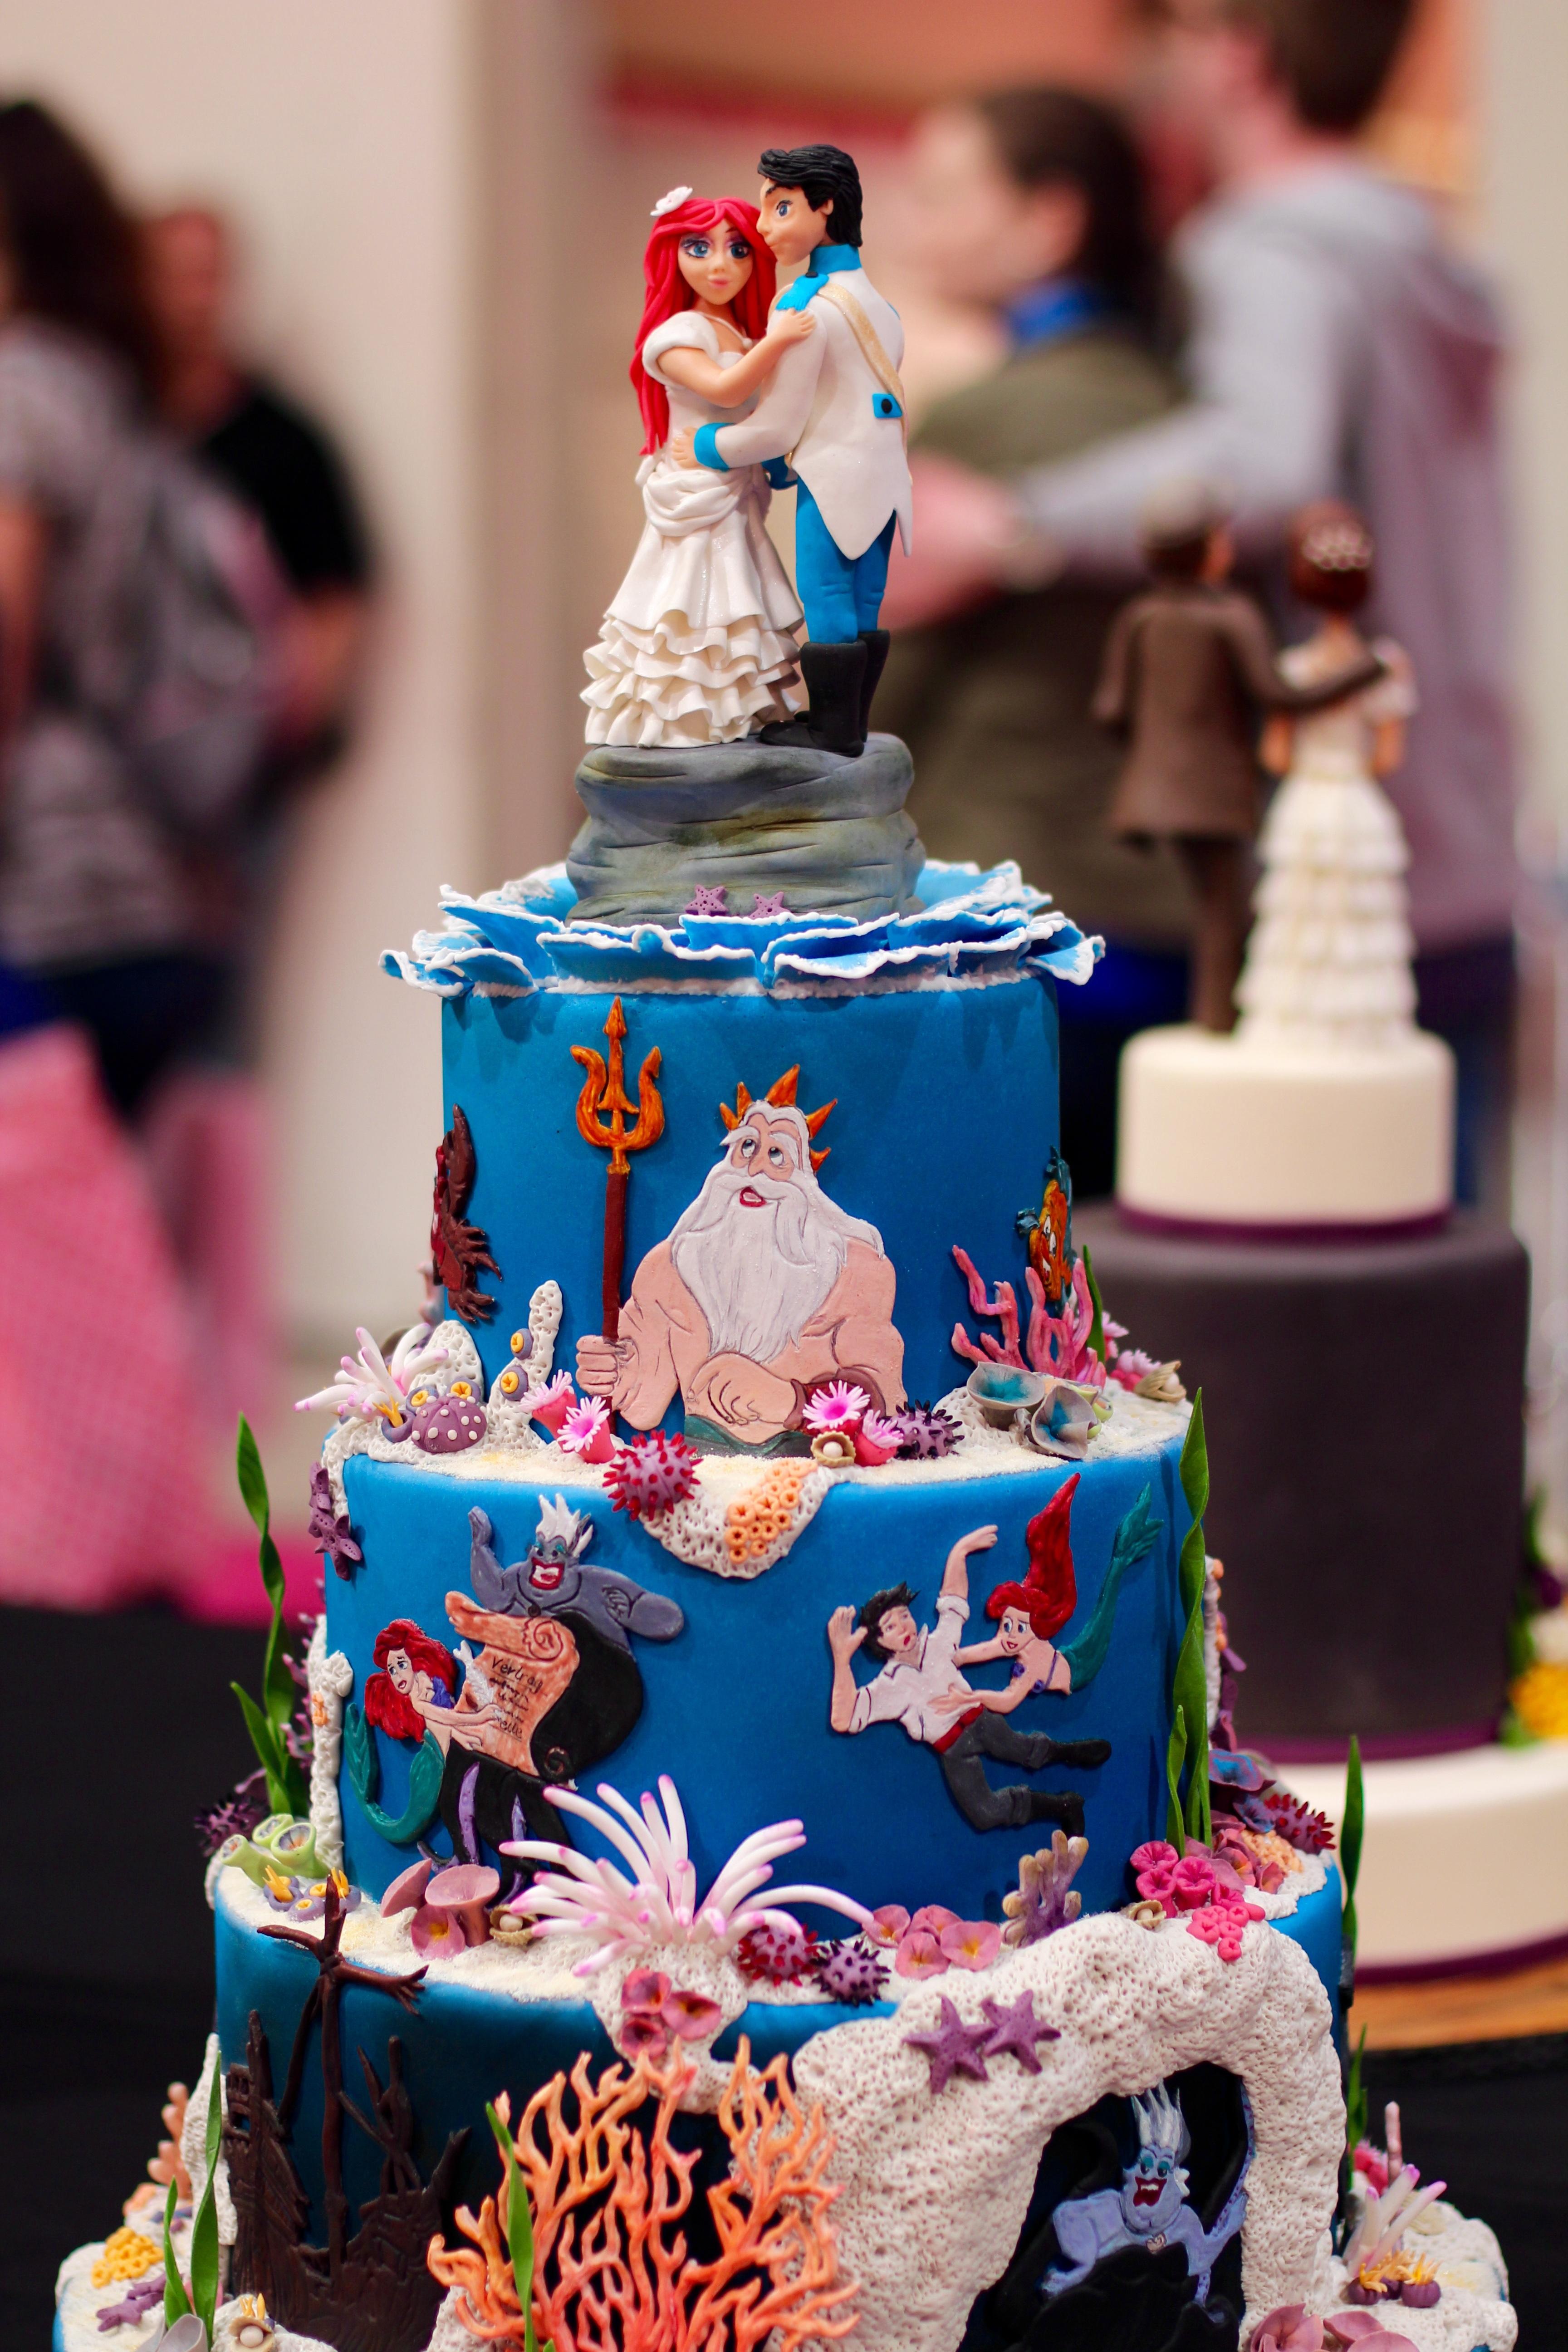 Gambar Model Makanan Pencuci Mulut Kue Ulang Tahun Pesta